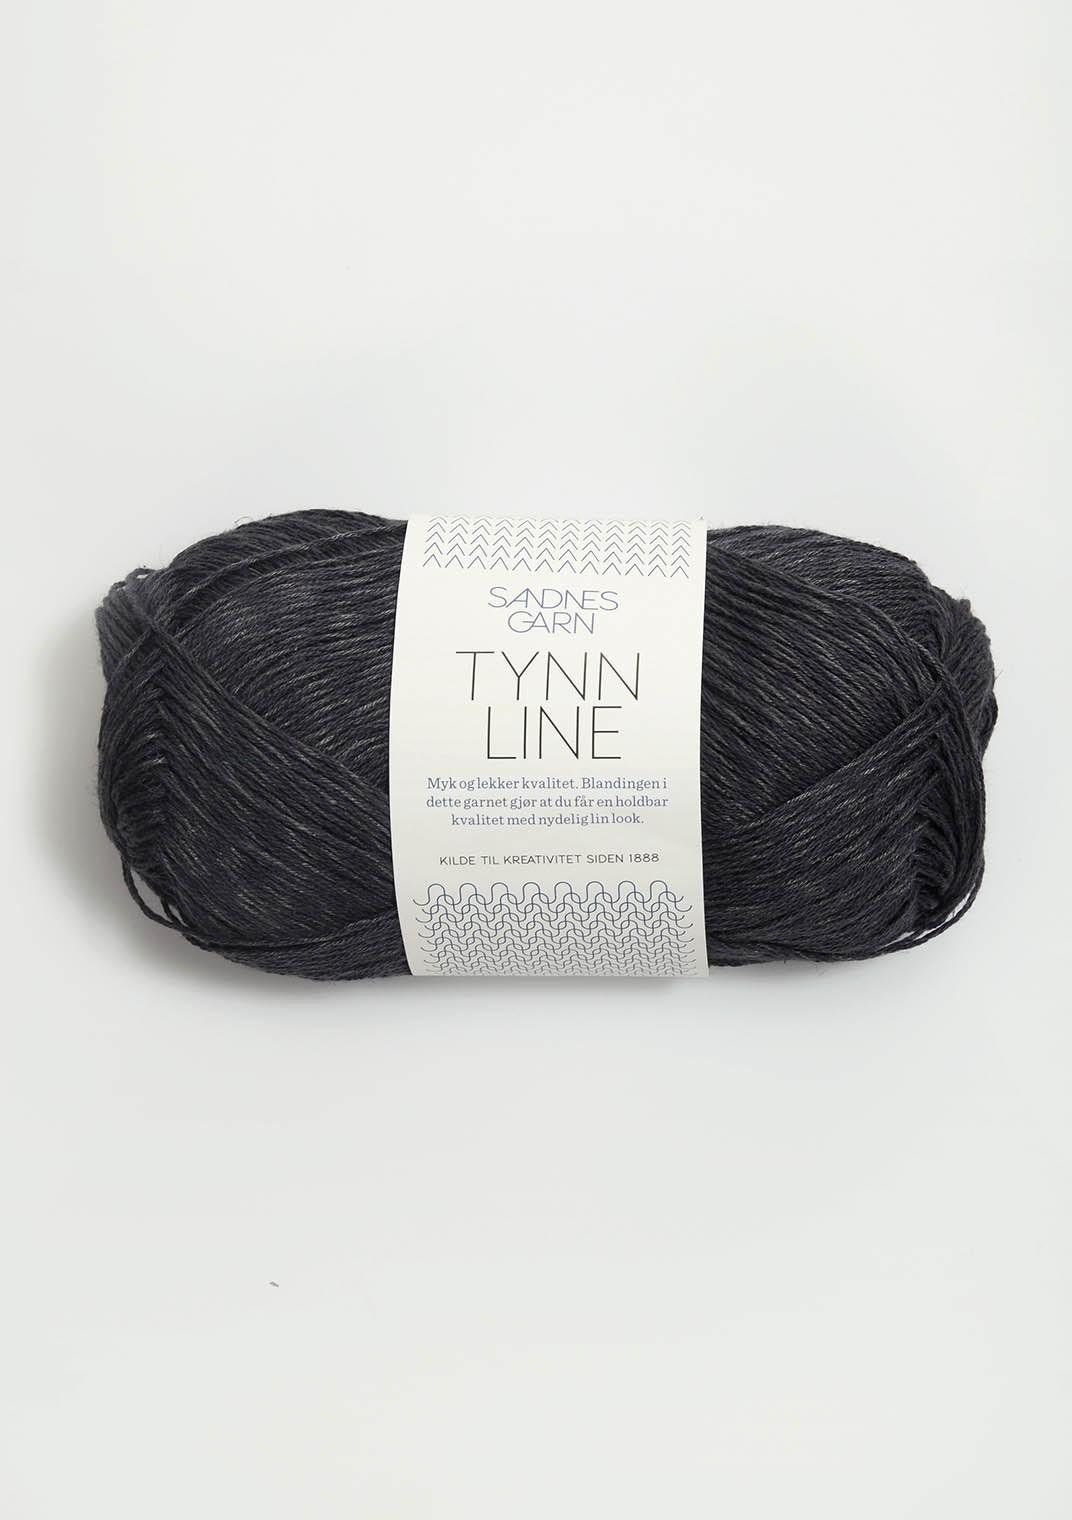 Sandnes Tynn line 6080, skiffer